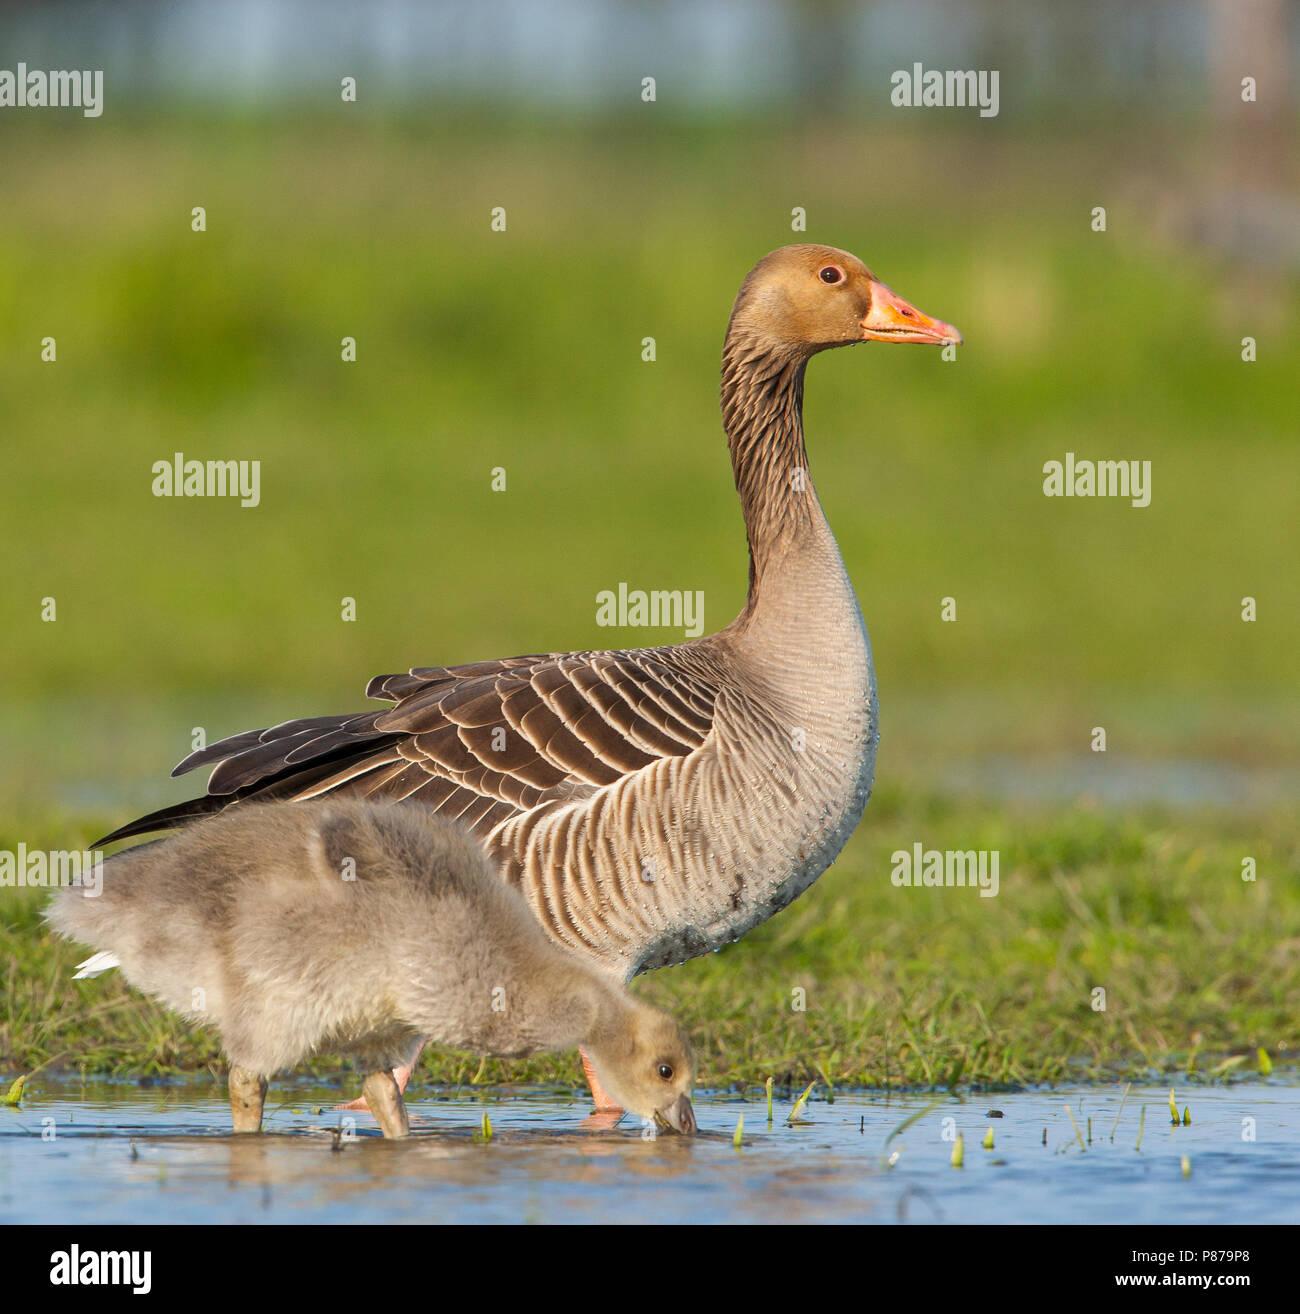 Grauwe Gans met jong, Grey-lag Goose with chick Stock Photo